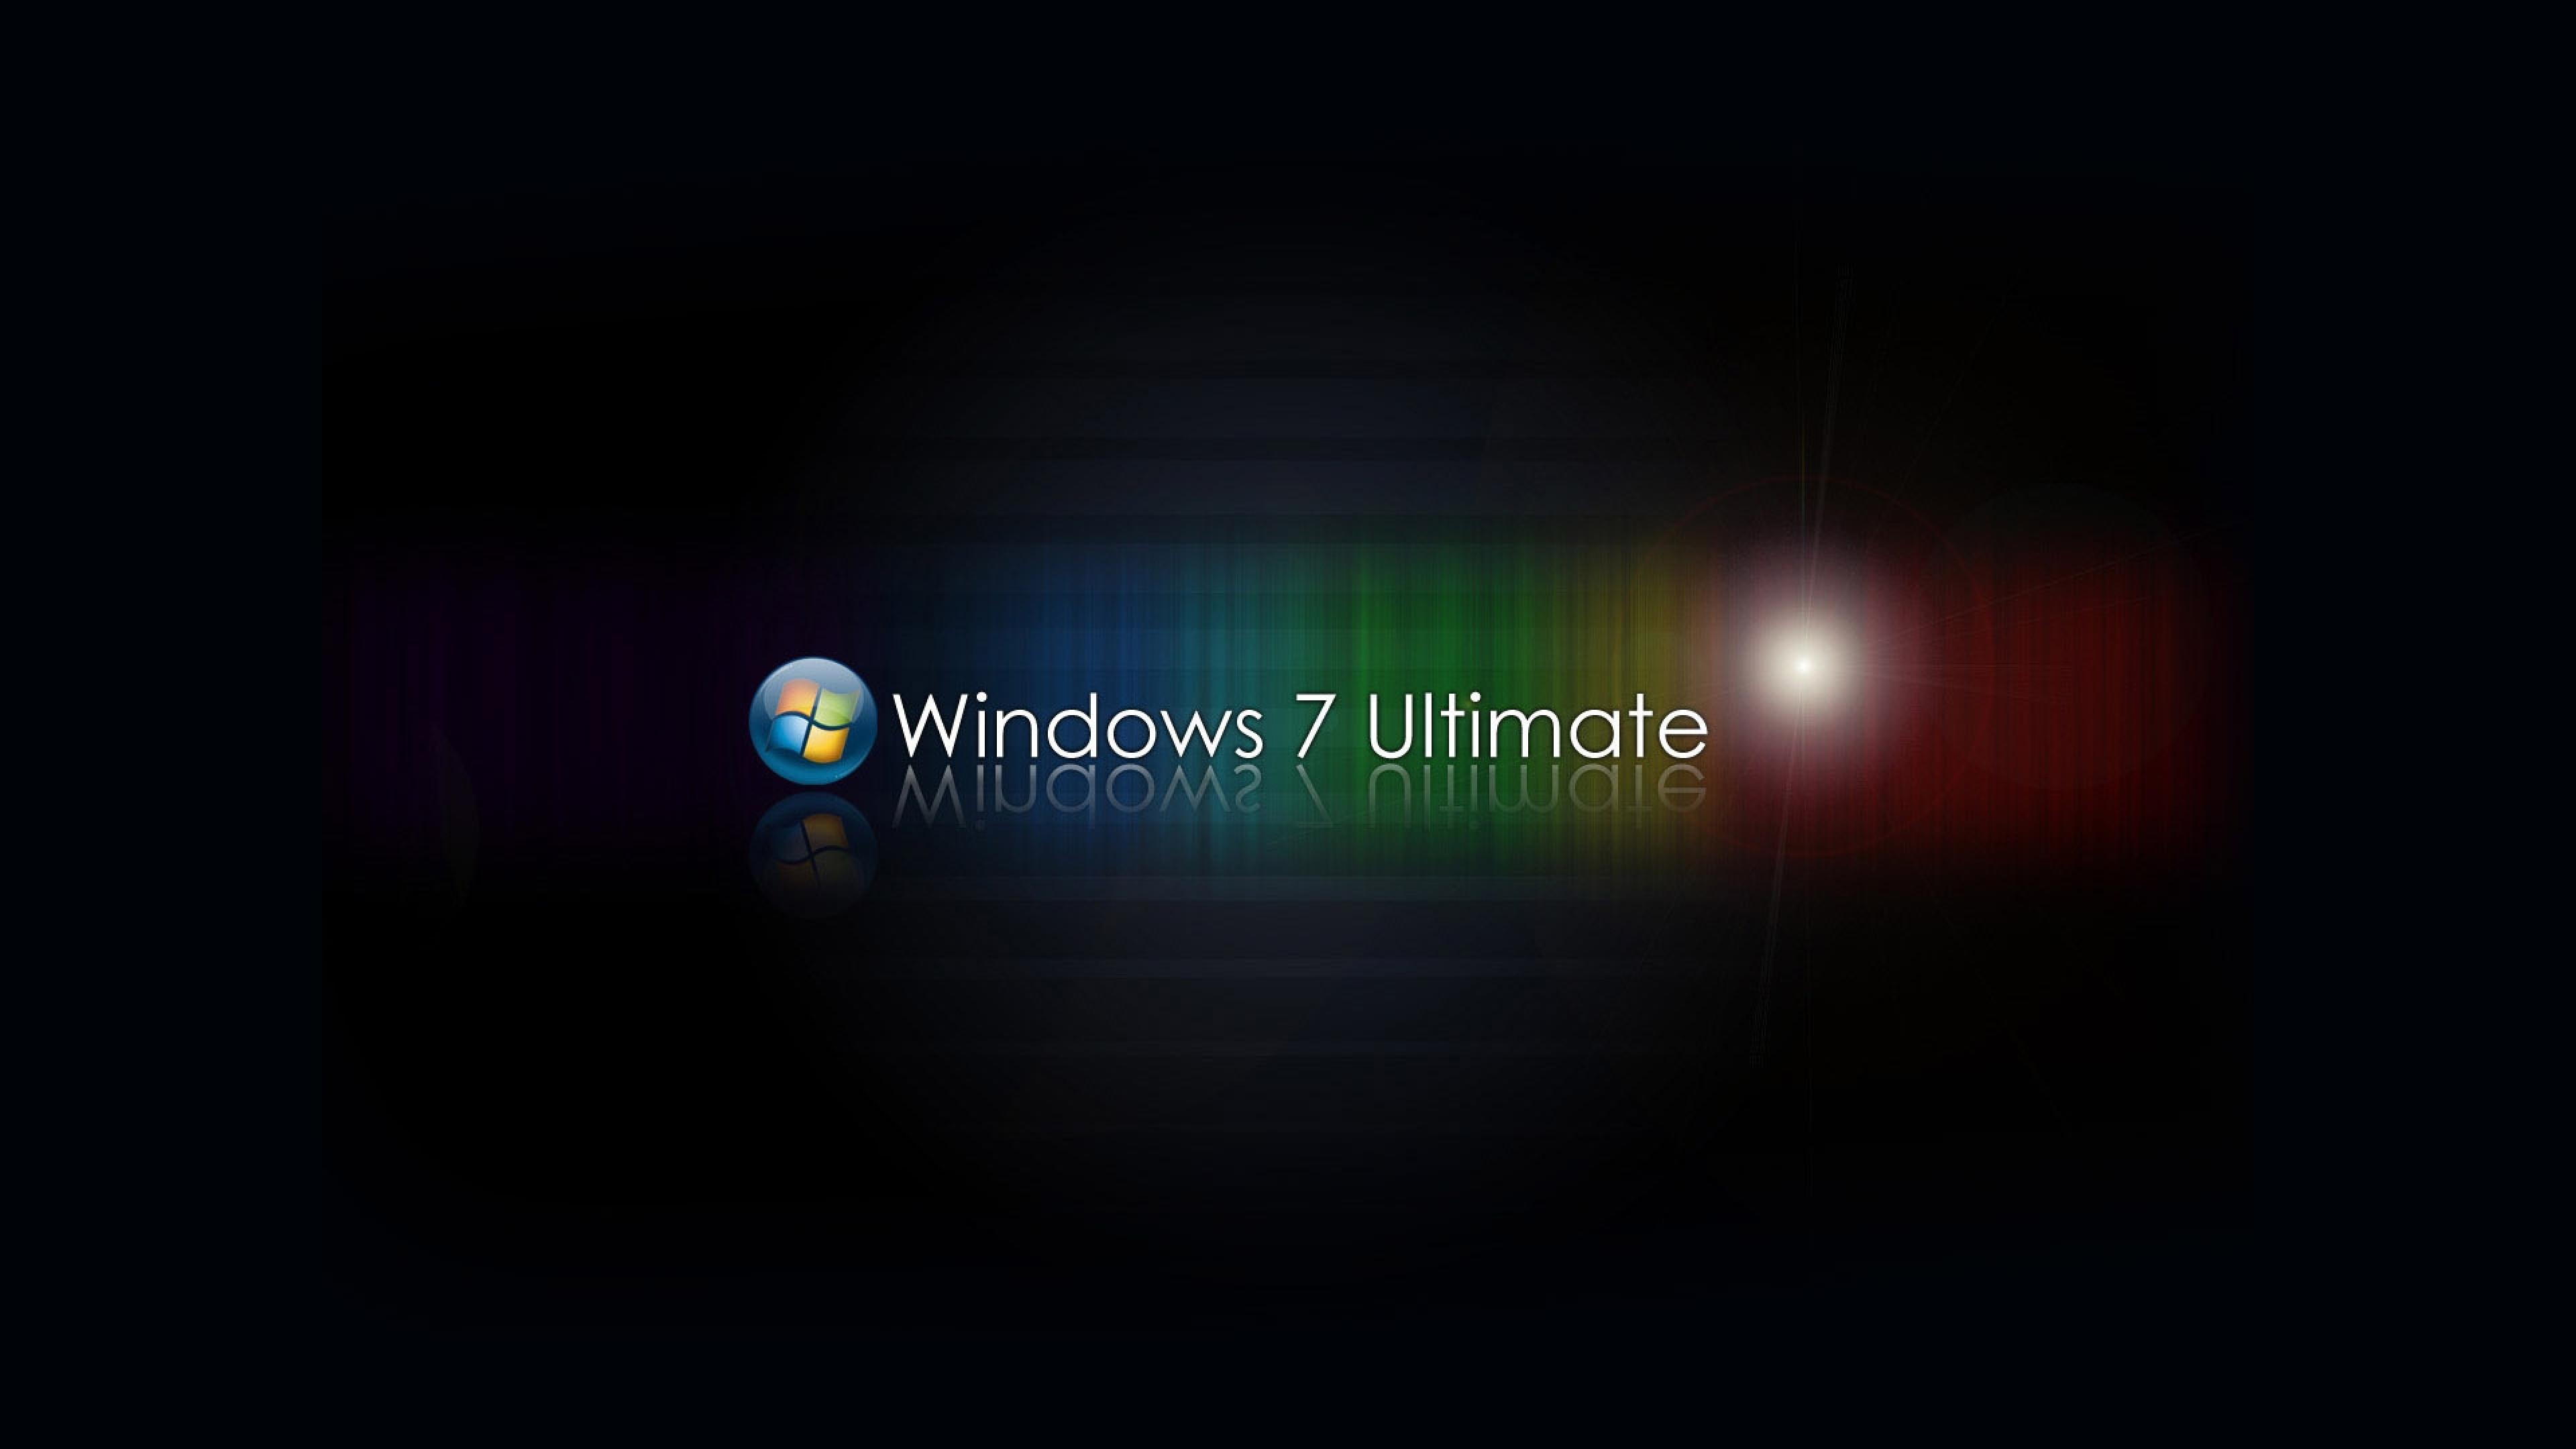 Windows 7 Ultimate Bright Black 4k Hd Desktop Wallpaper For